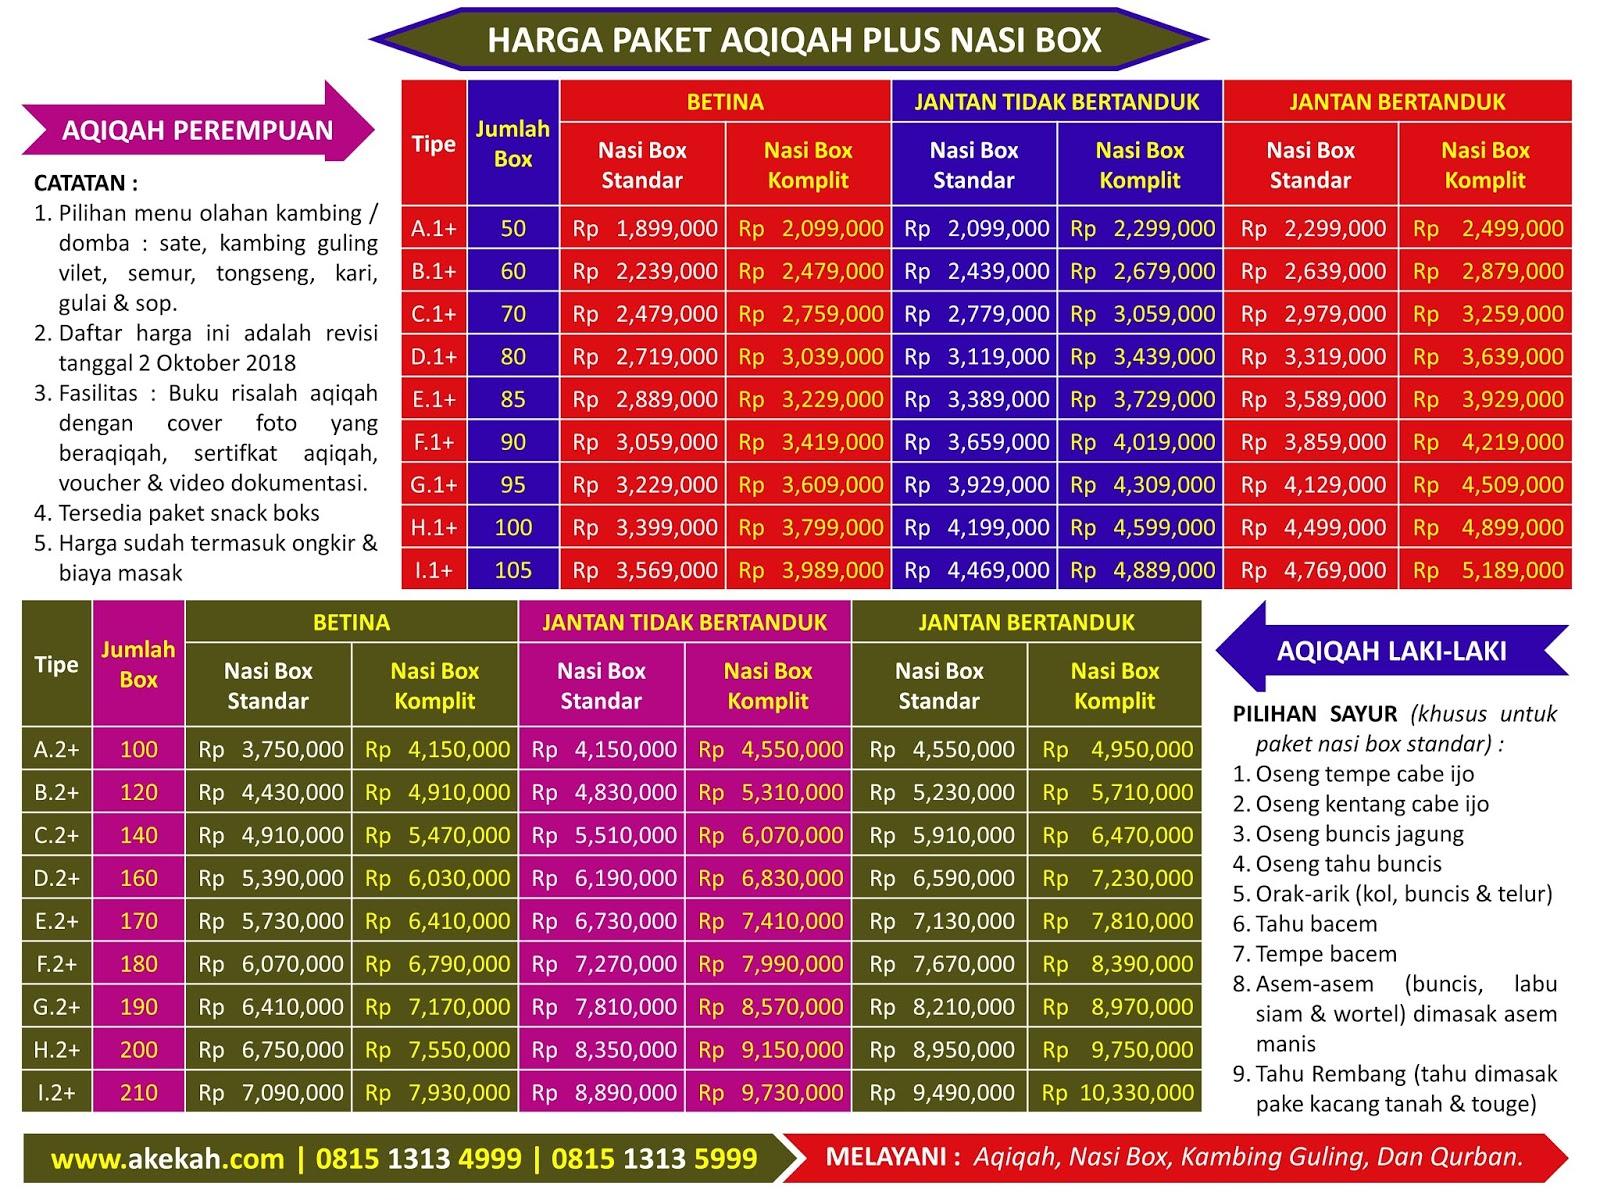 Penyedia Aqiqah Yang Murah Untuk Laki-Laki Daerah Jasinga Bogor